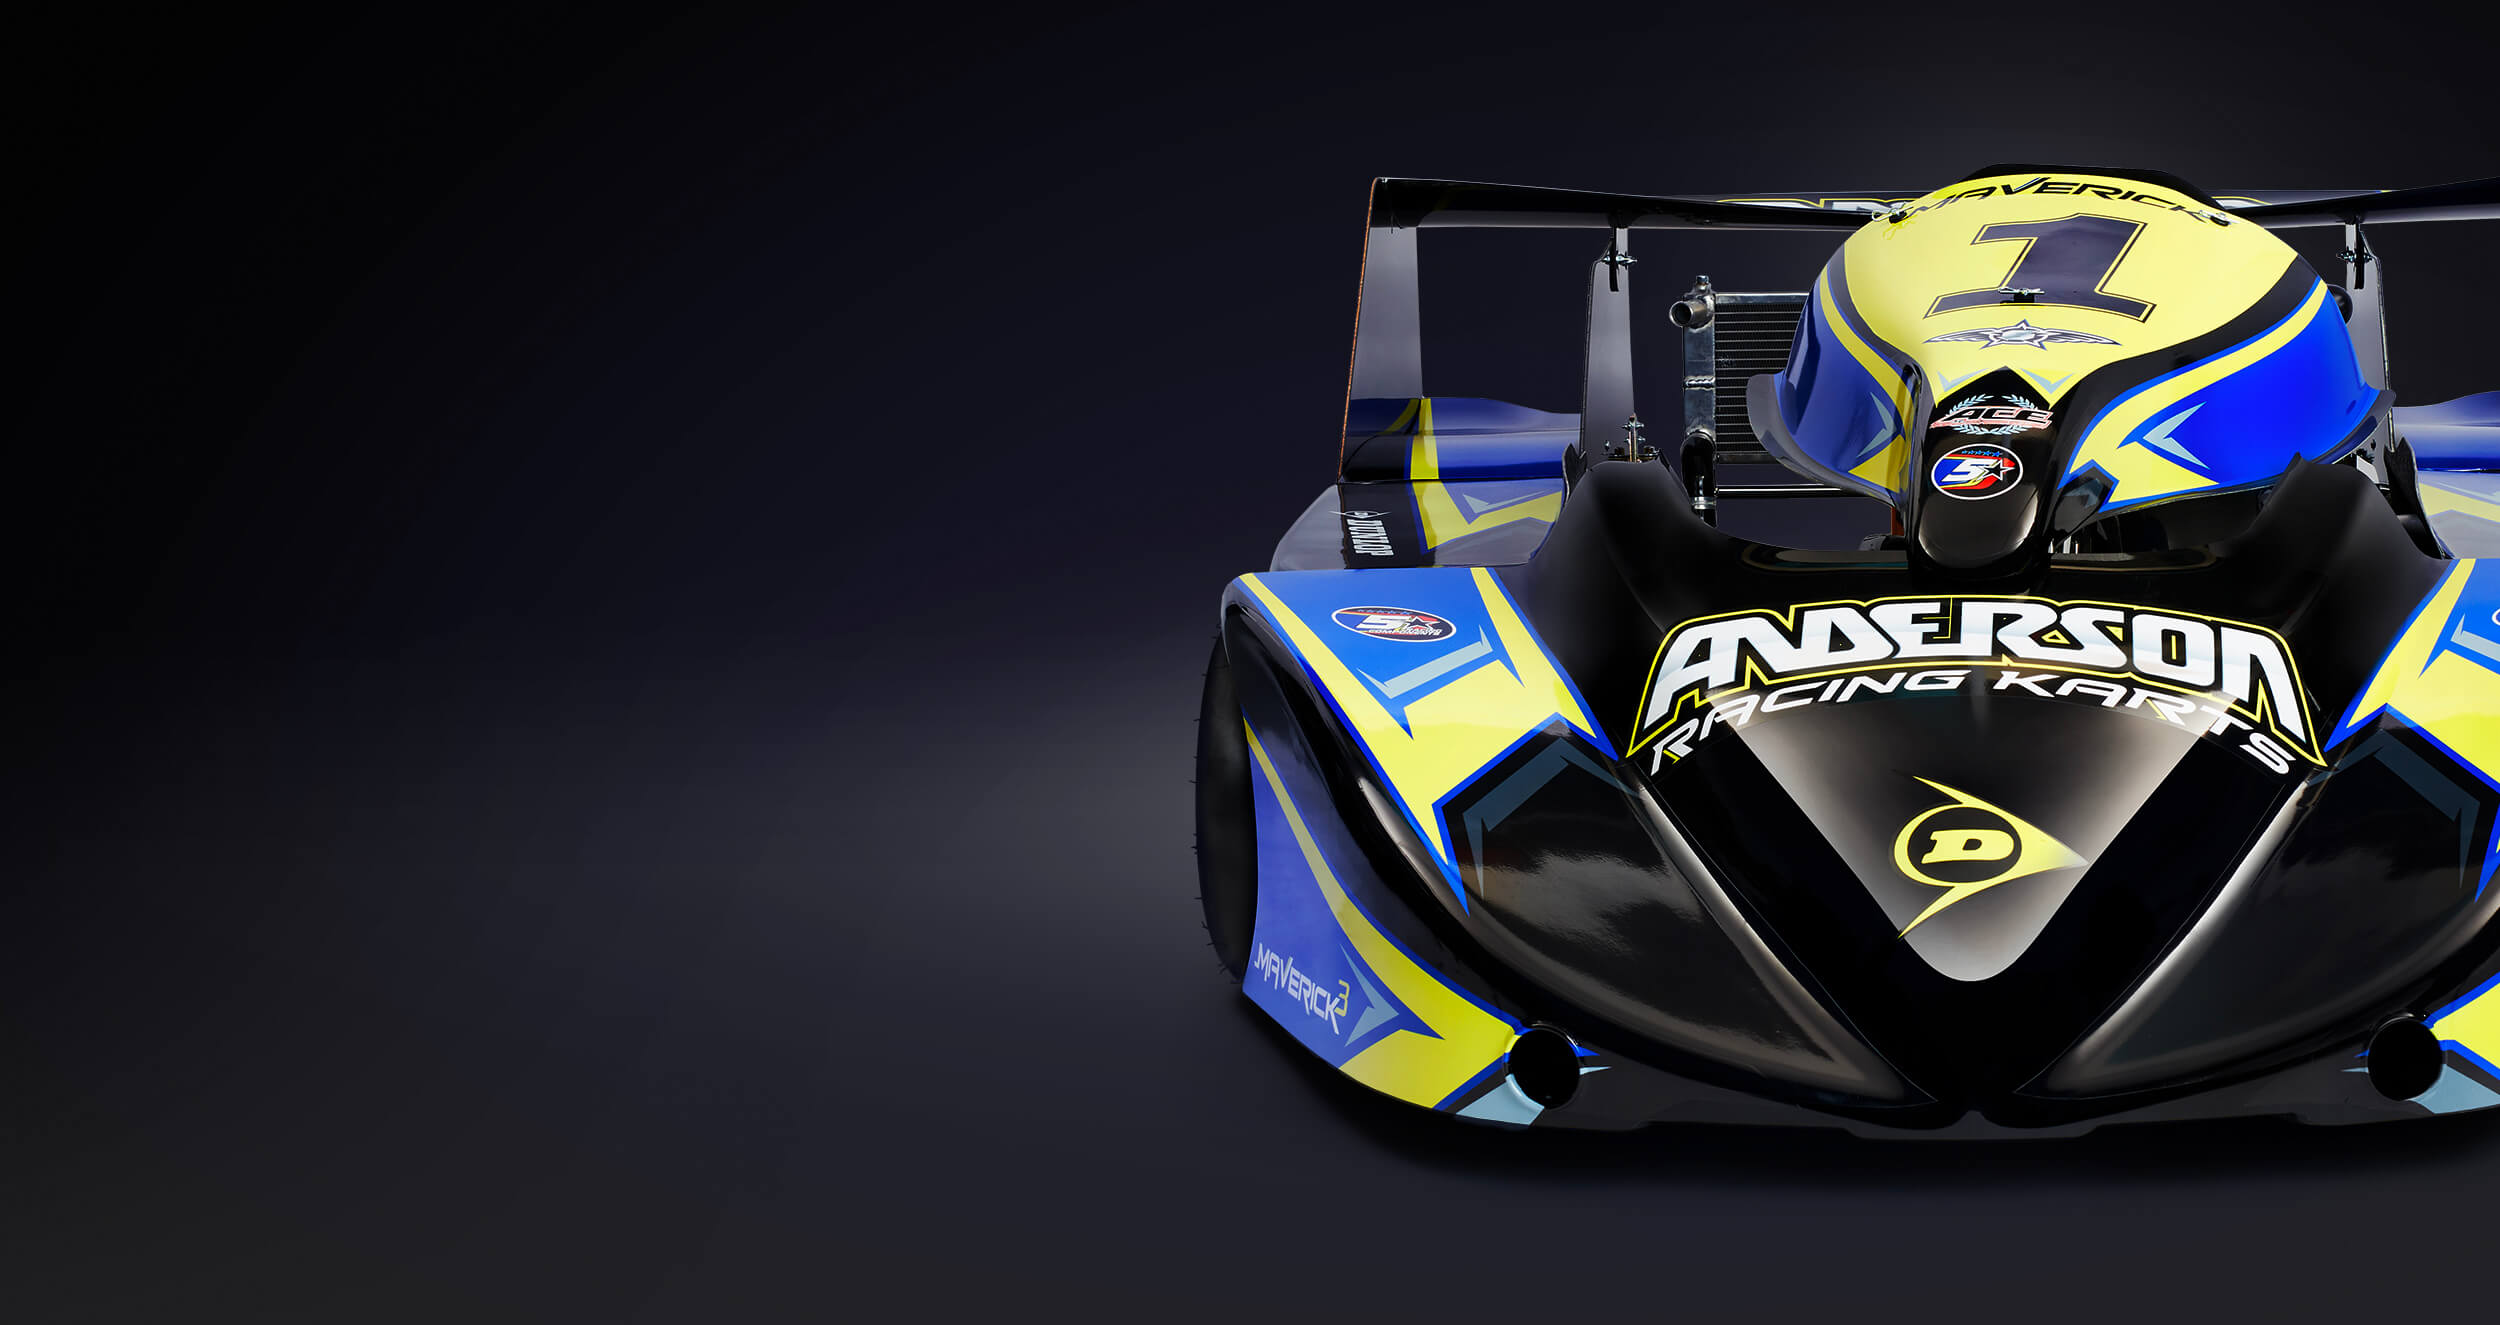 Anderson Karts Marverick 3 250 Div 1 Superkart